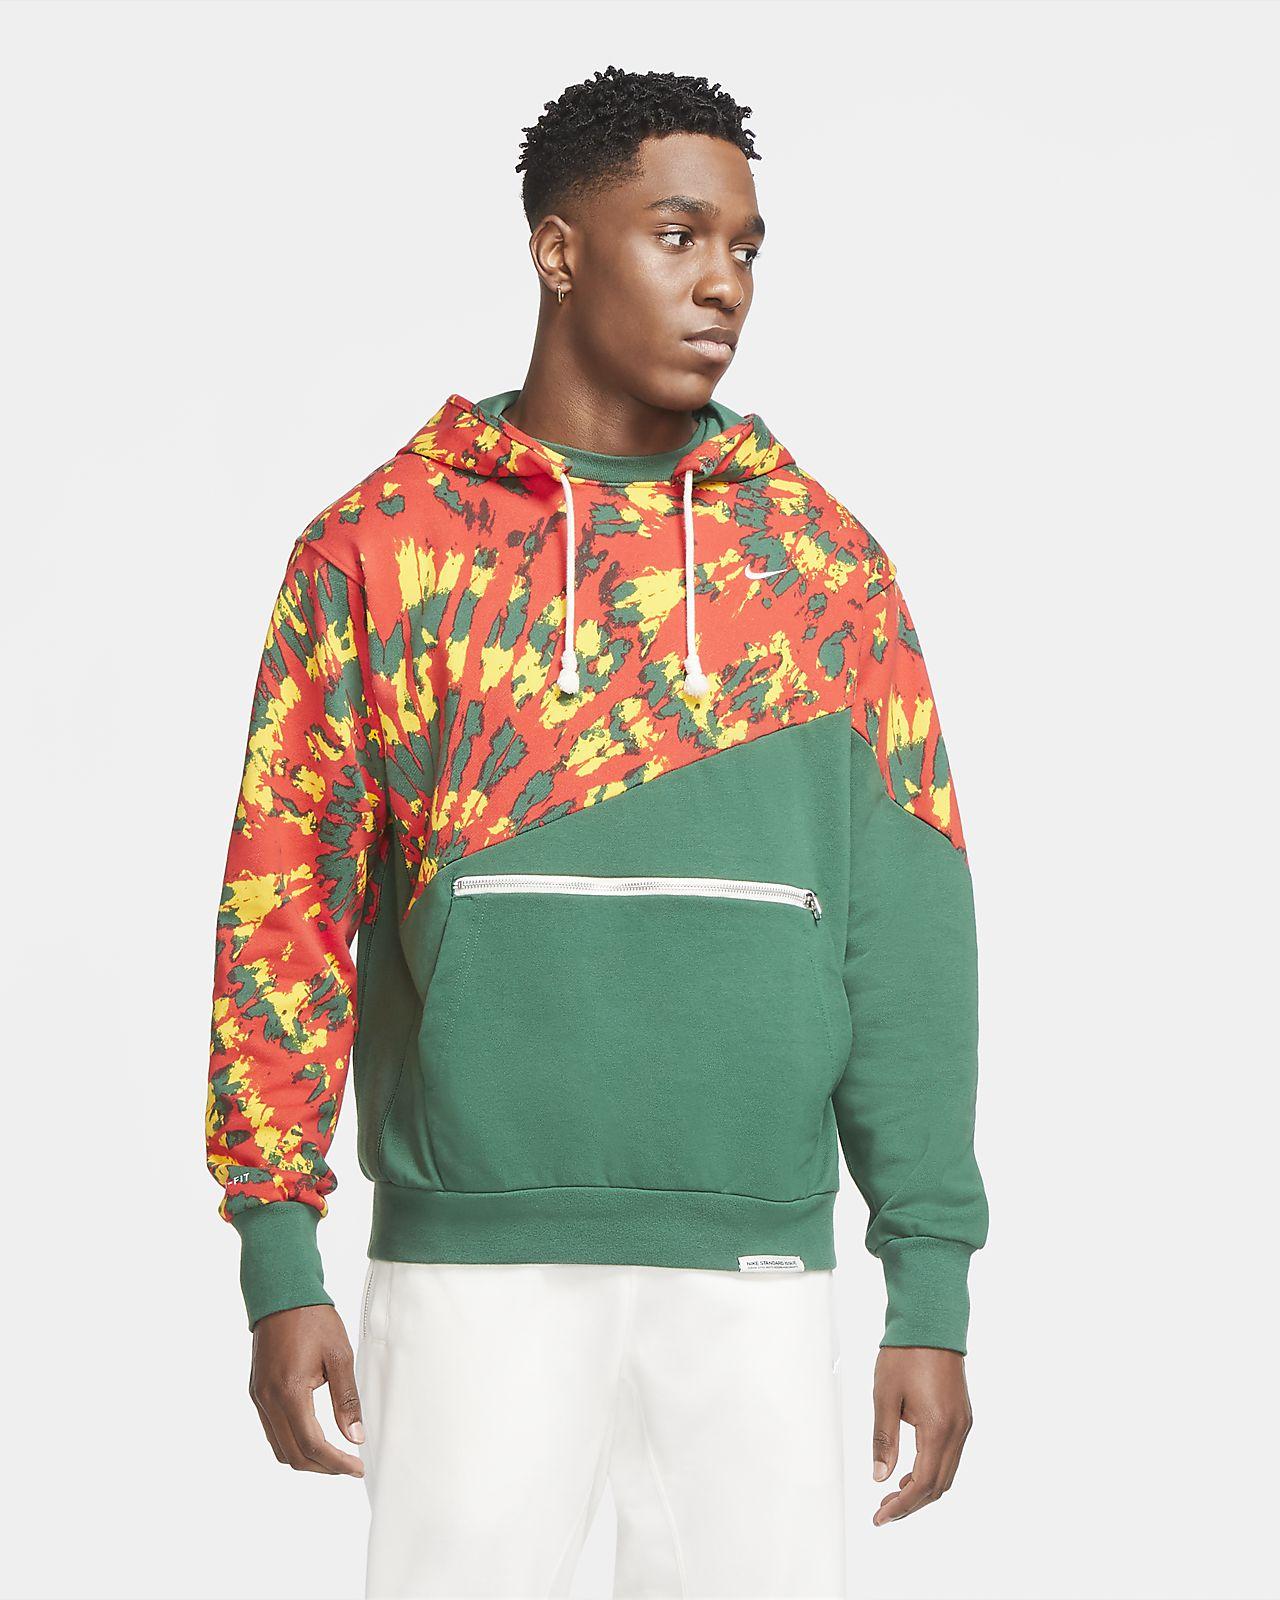 Nike Throwback Men's Basketball Pullover Hoodie